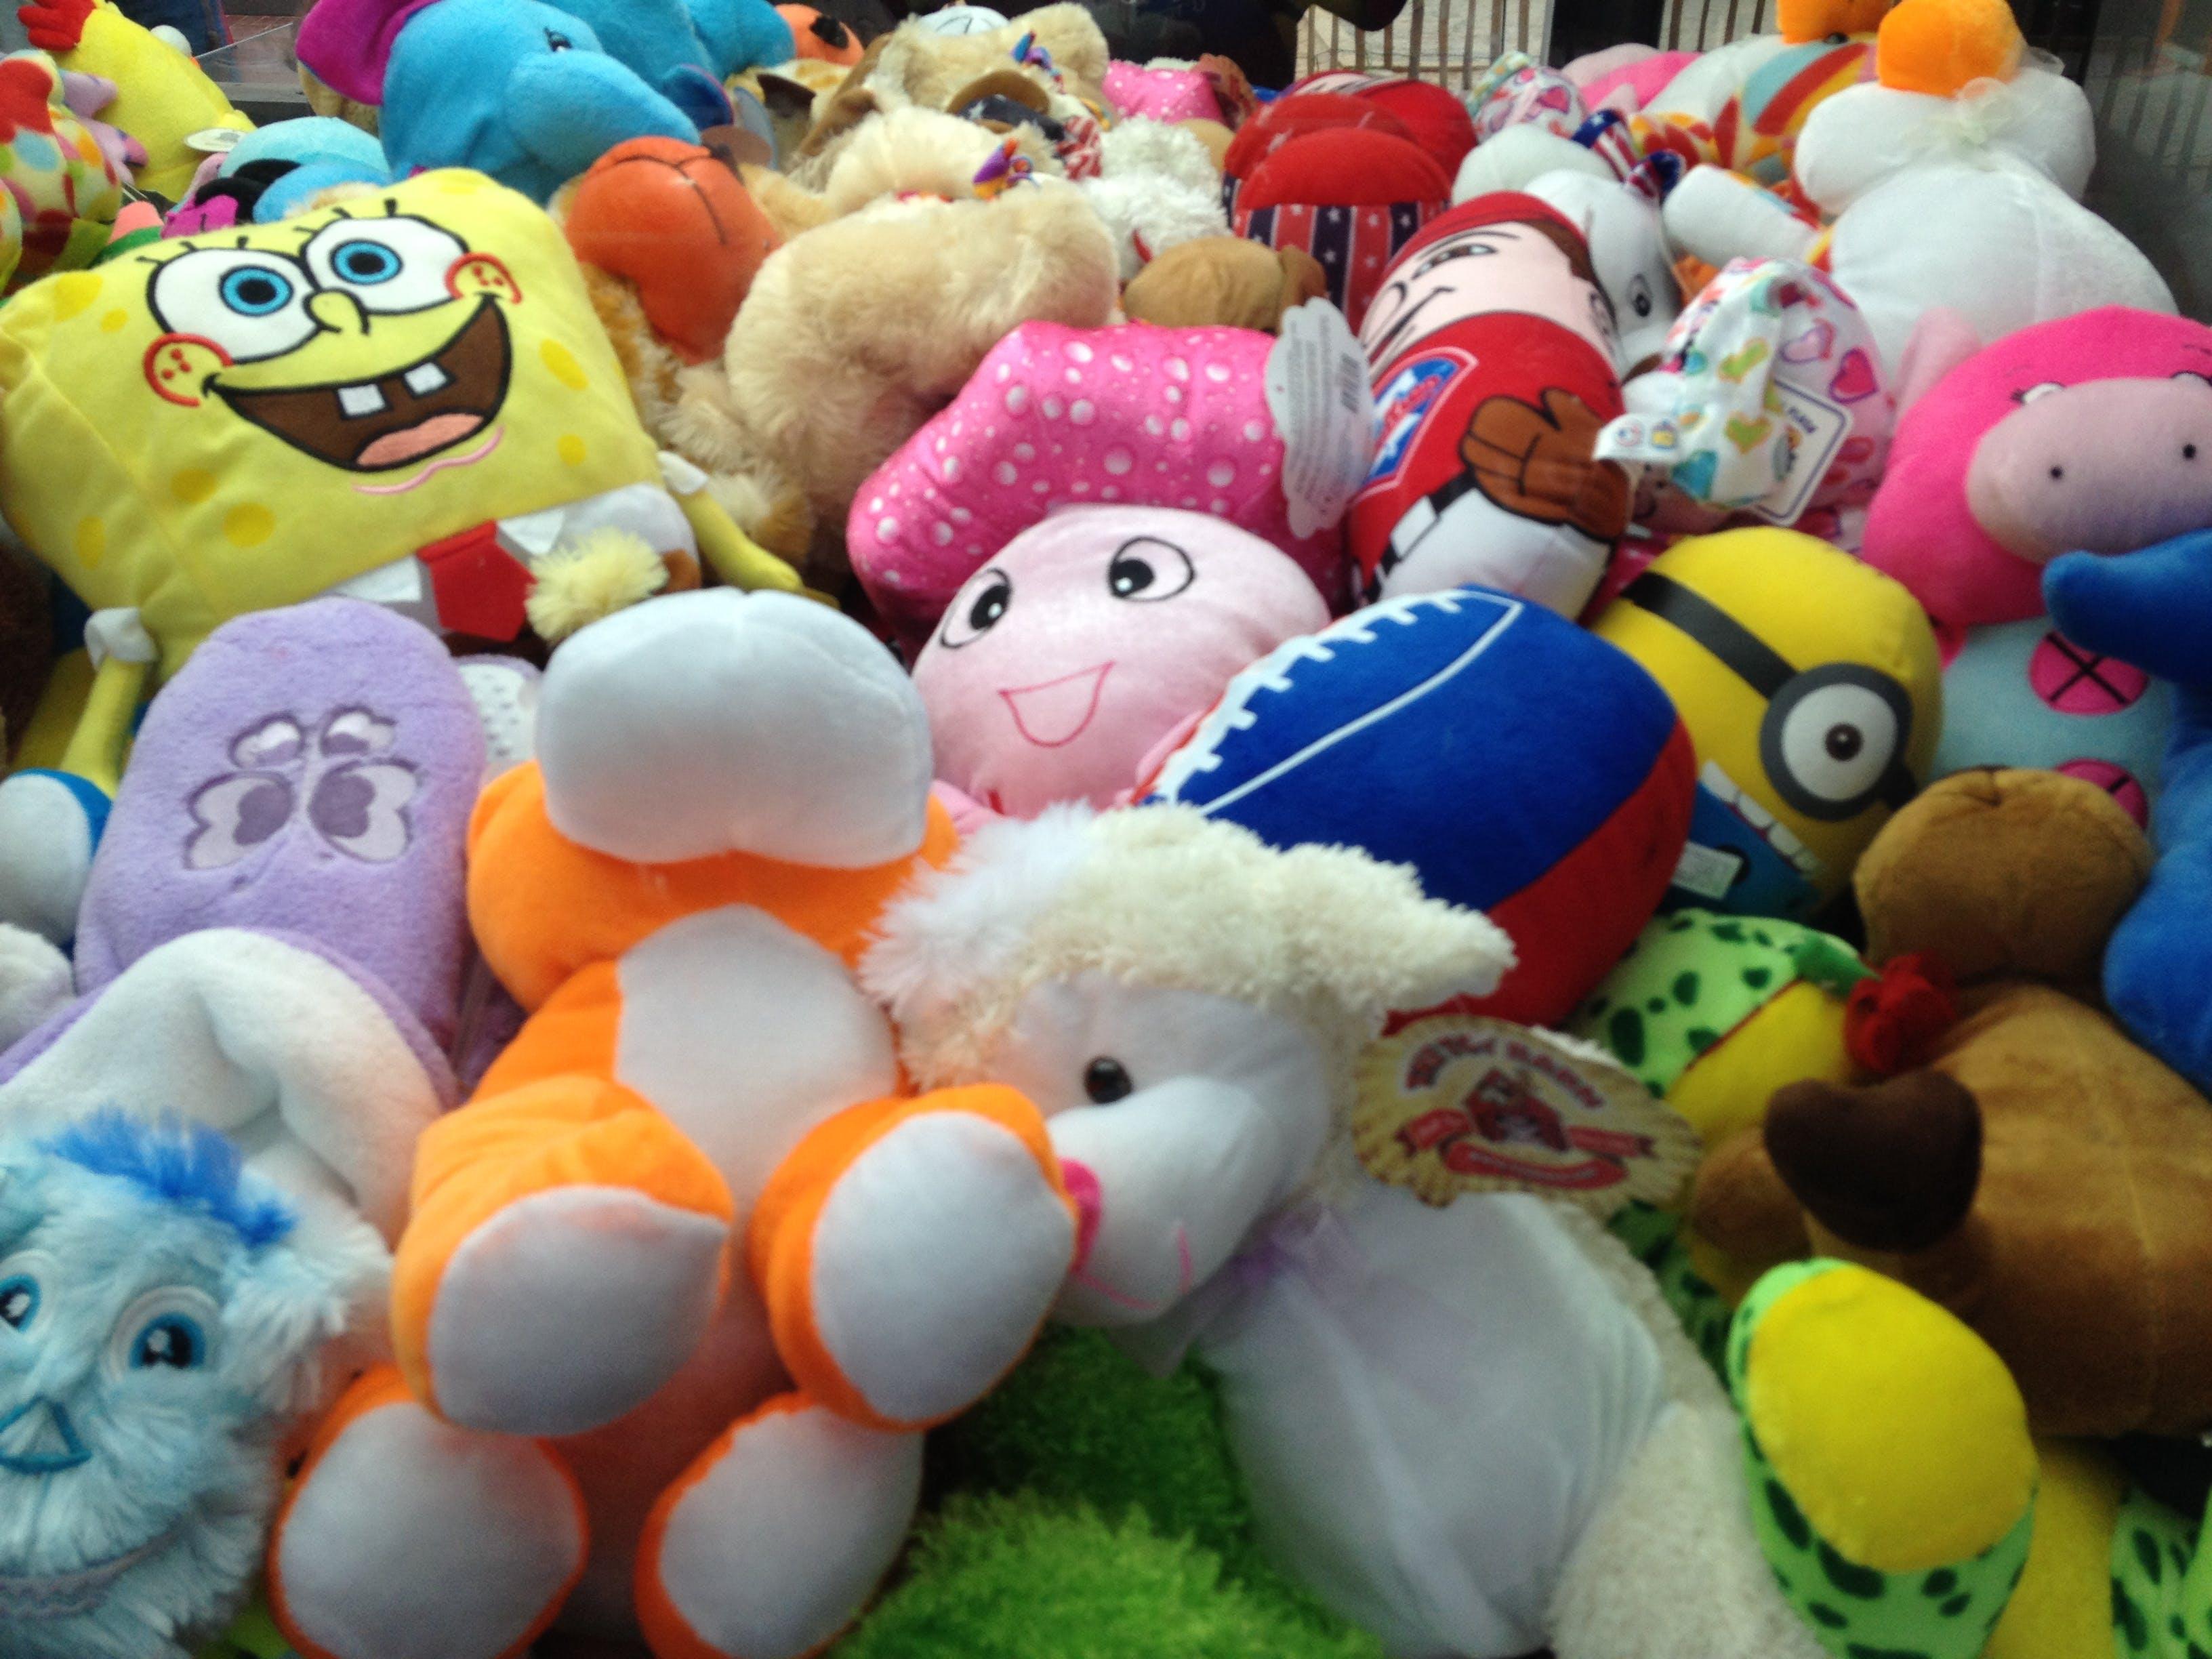 Free stock photo of boardwalk, carnival, kids toy, toys